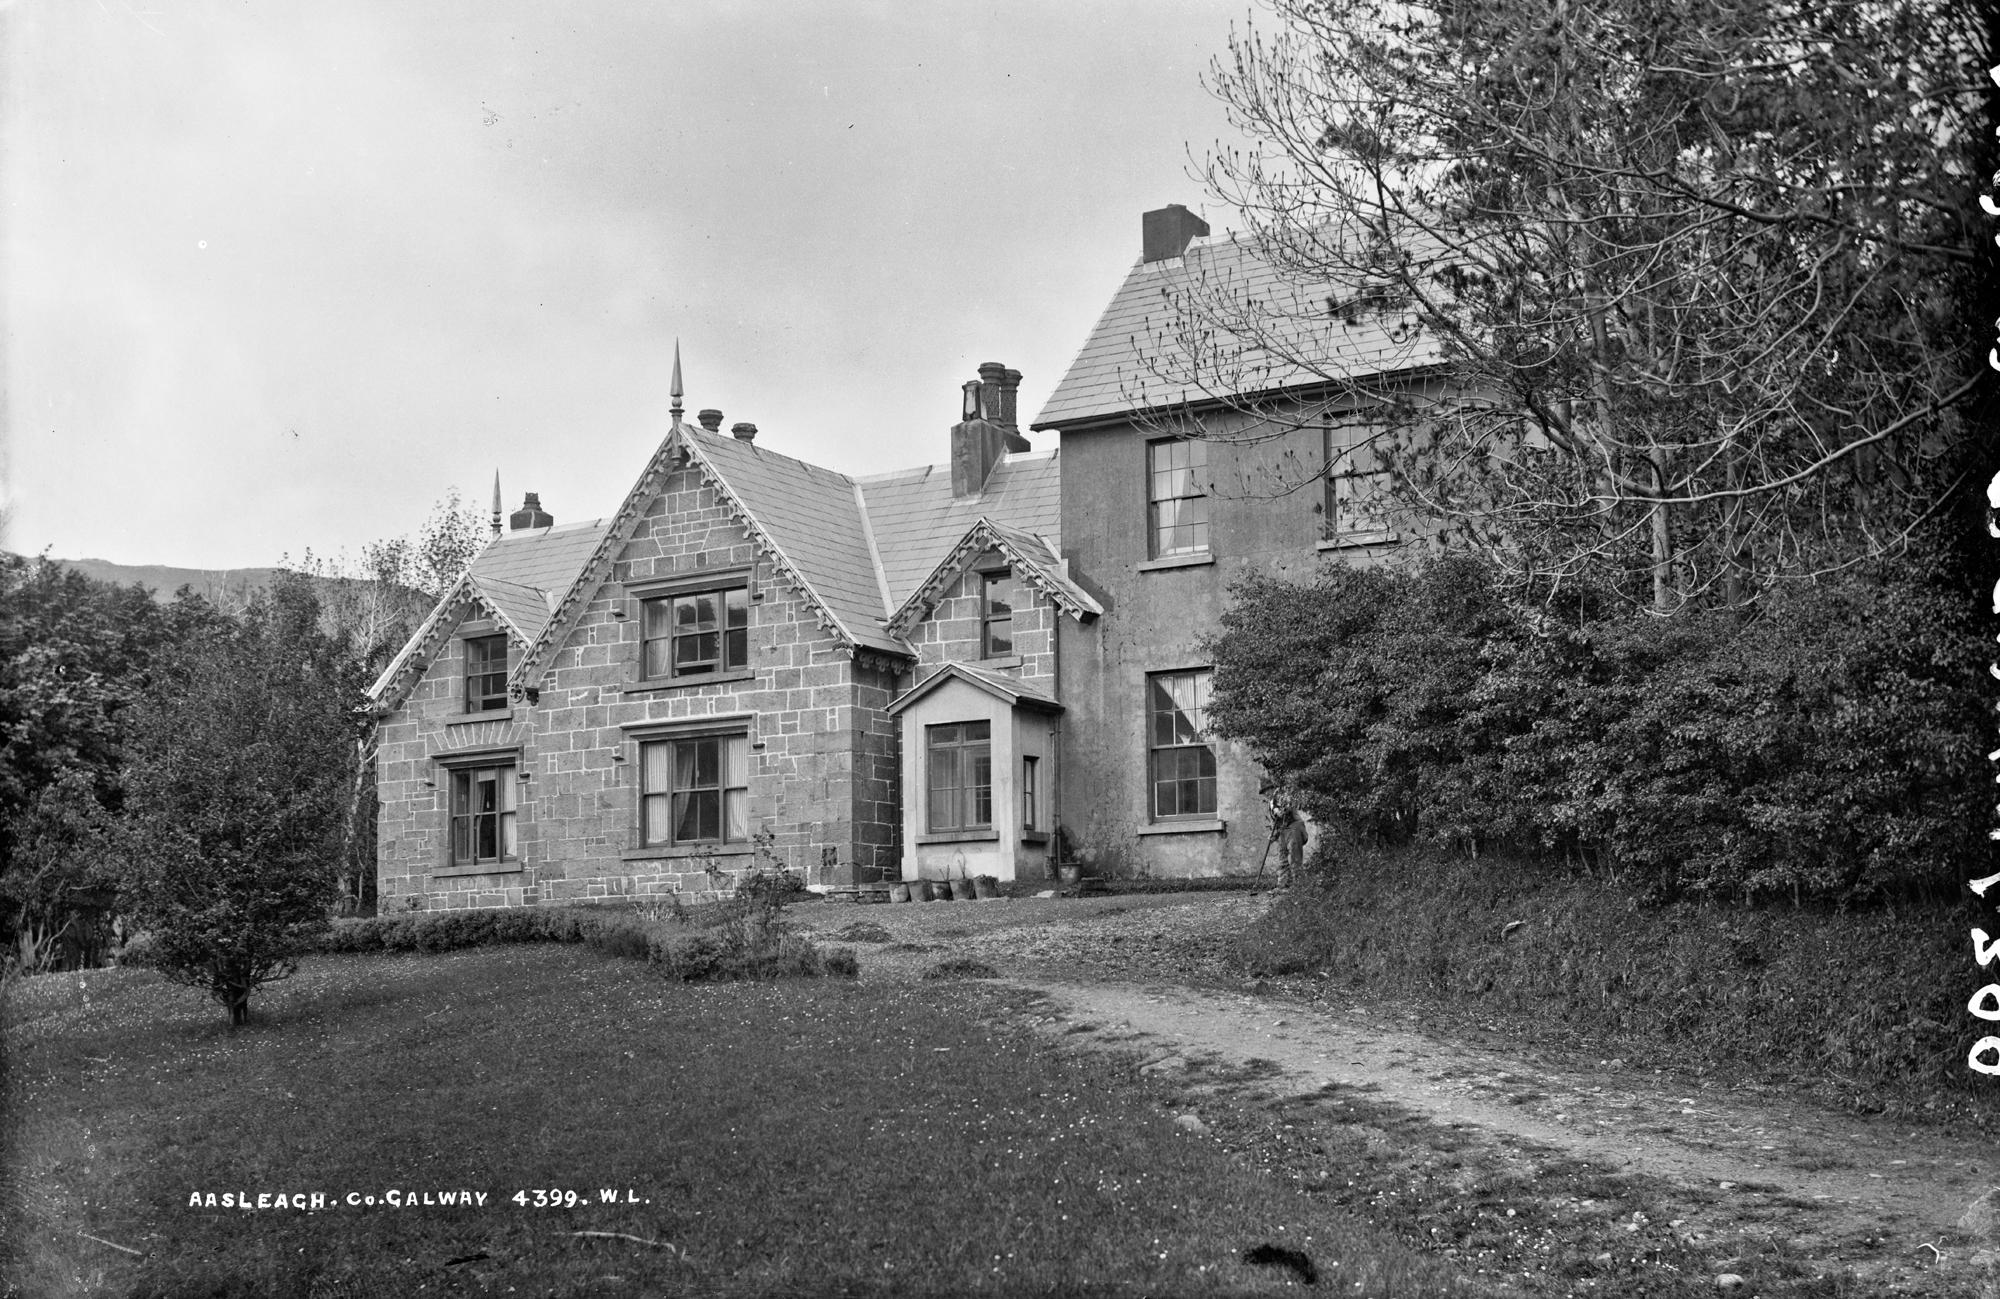 Aasleagh, Assleagh, Co. Galway